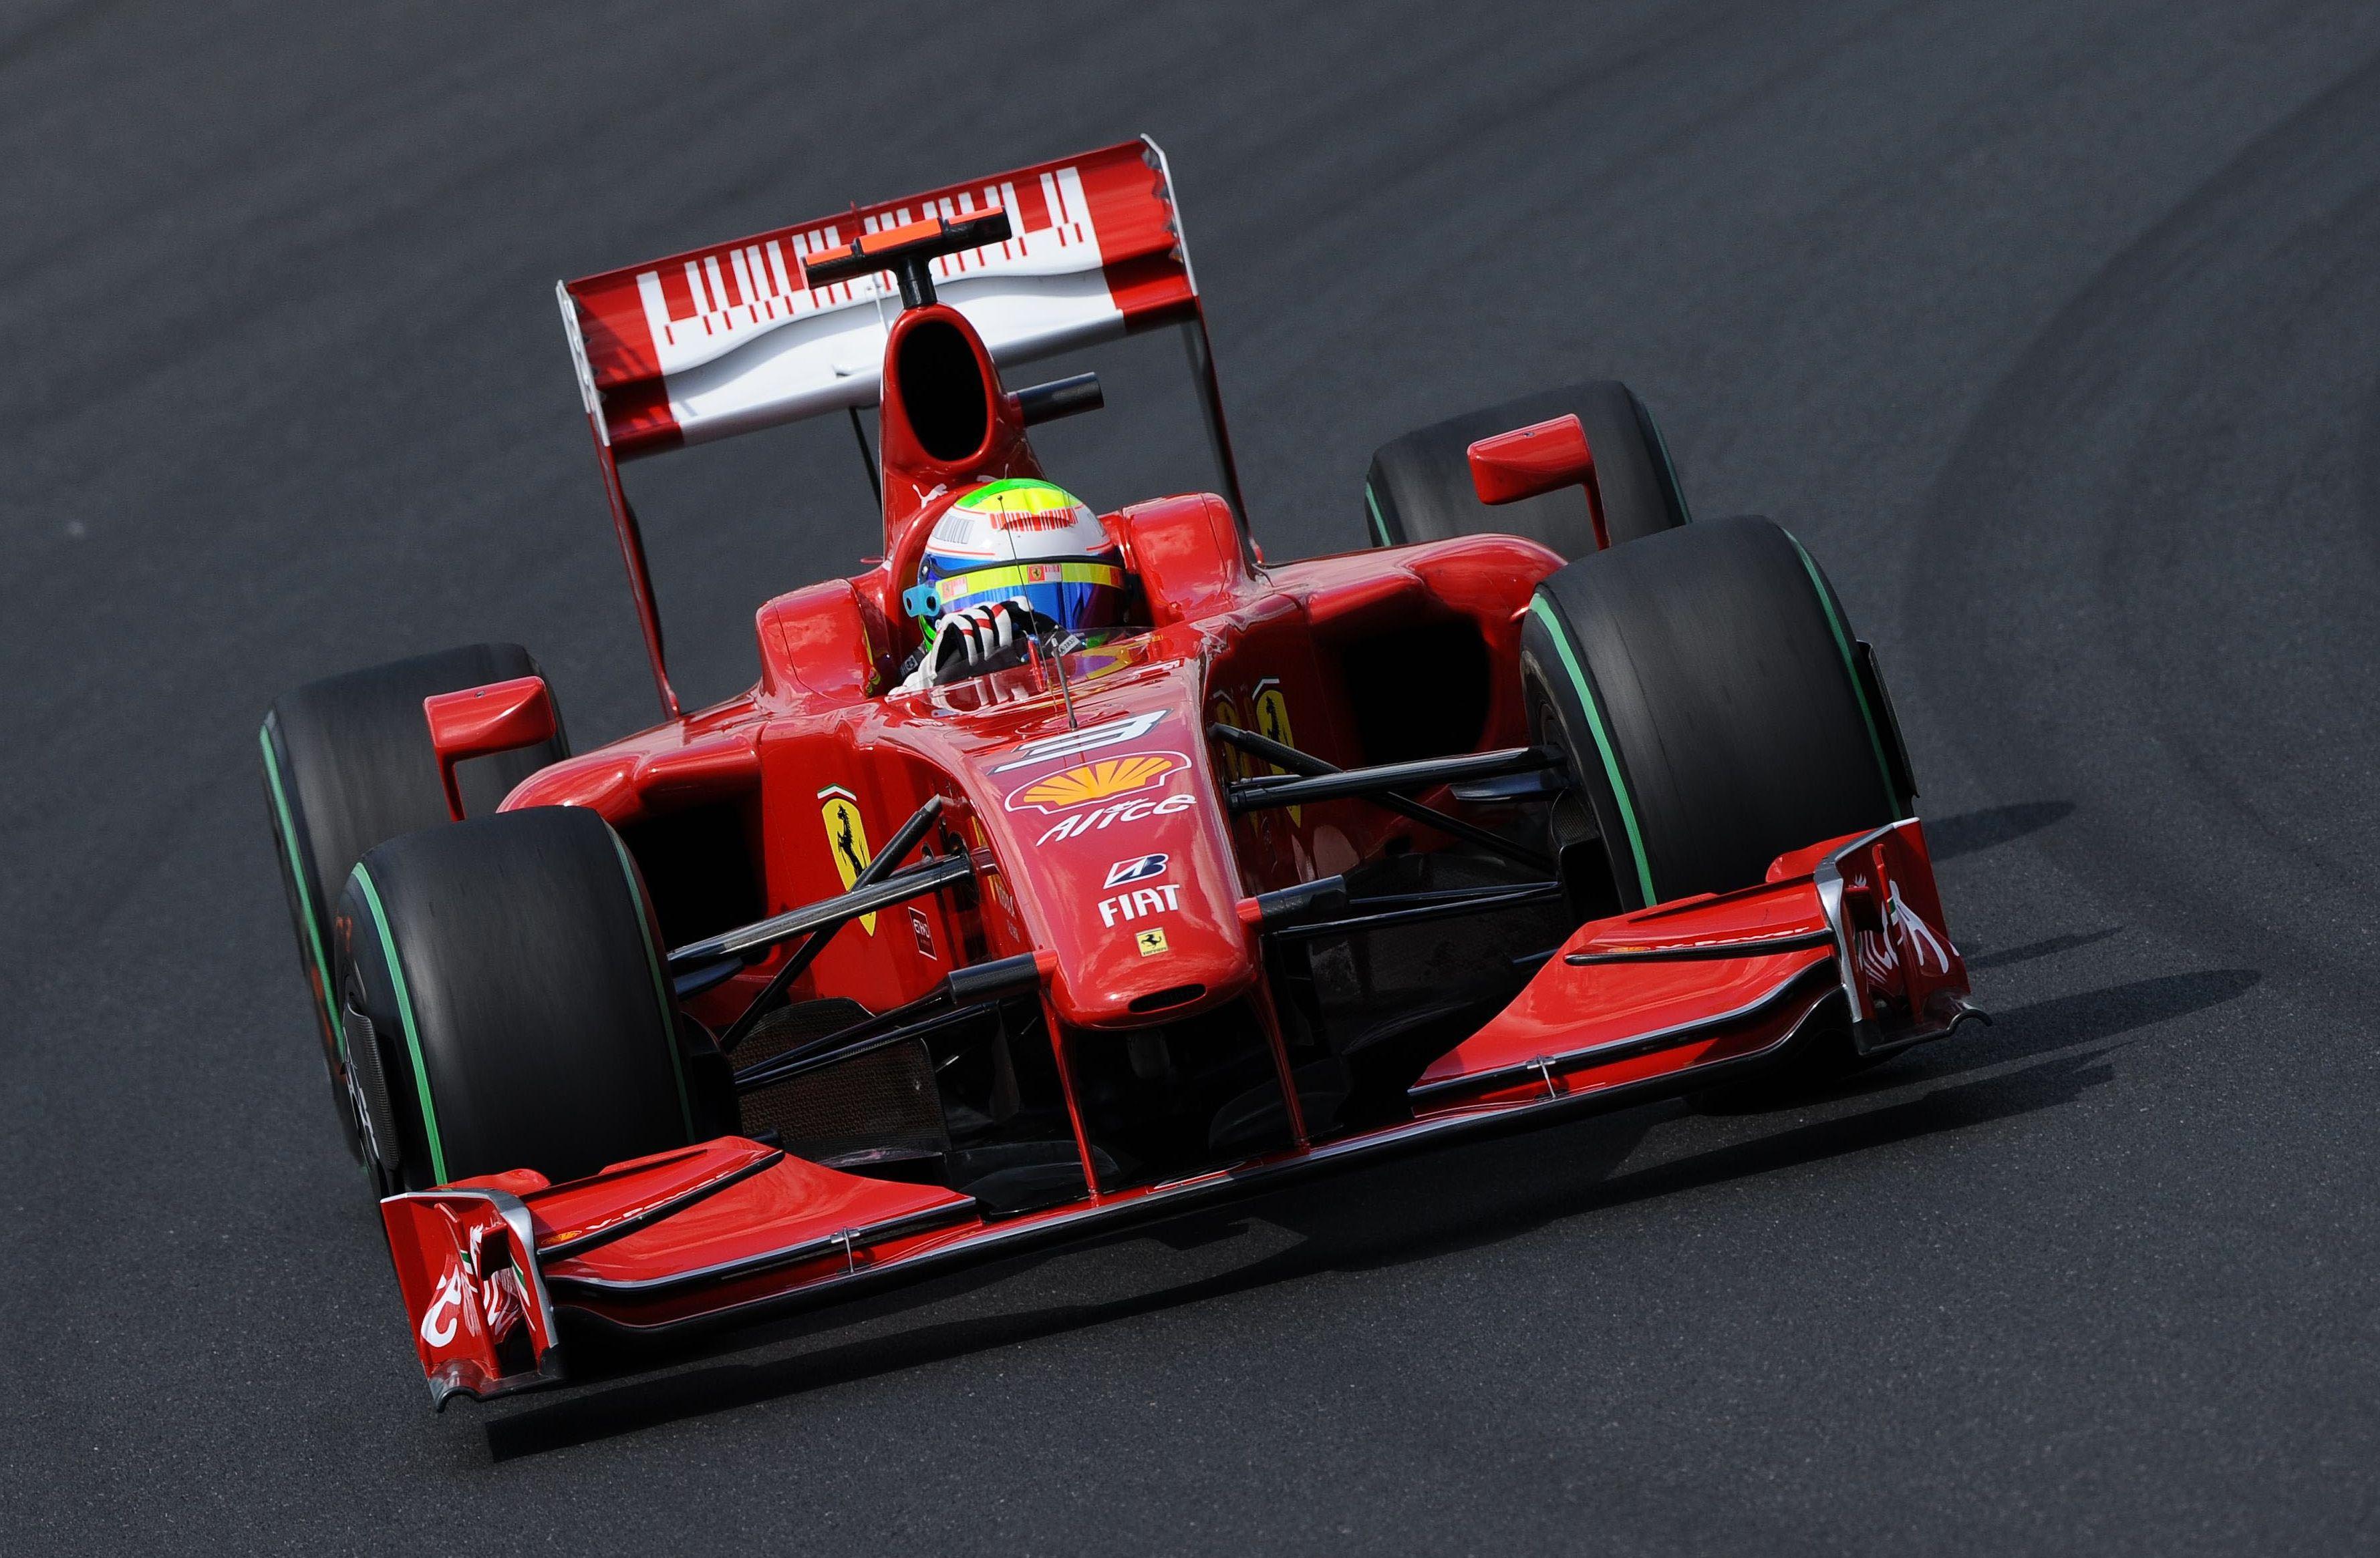 Ferrari boss says he has the best drivers